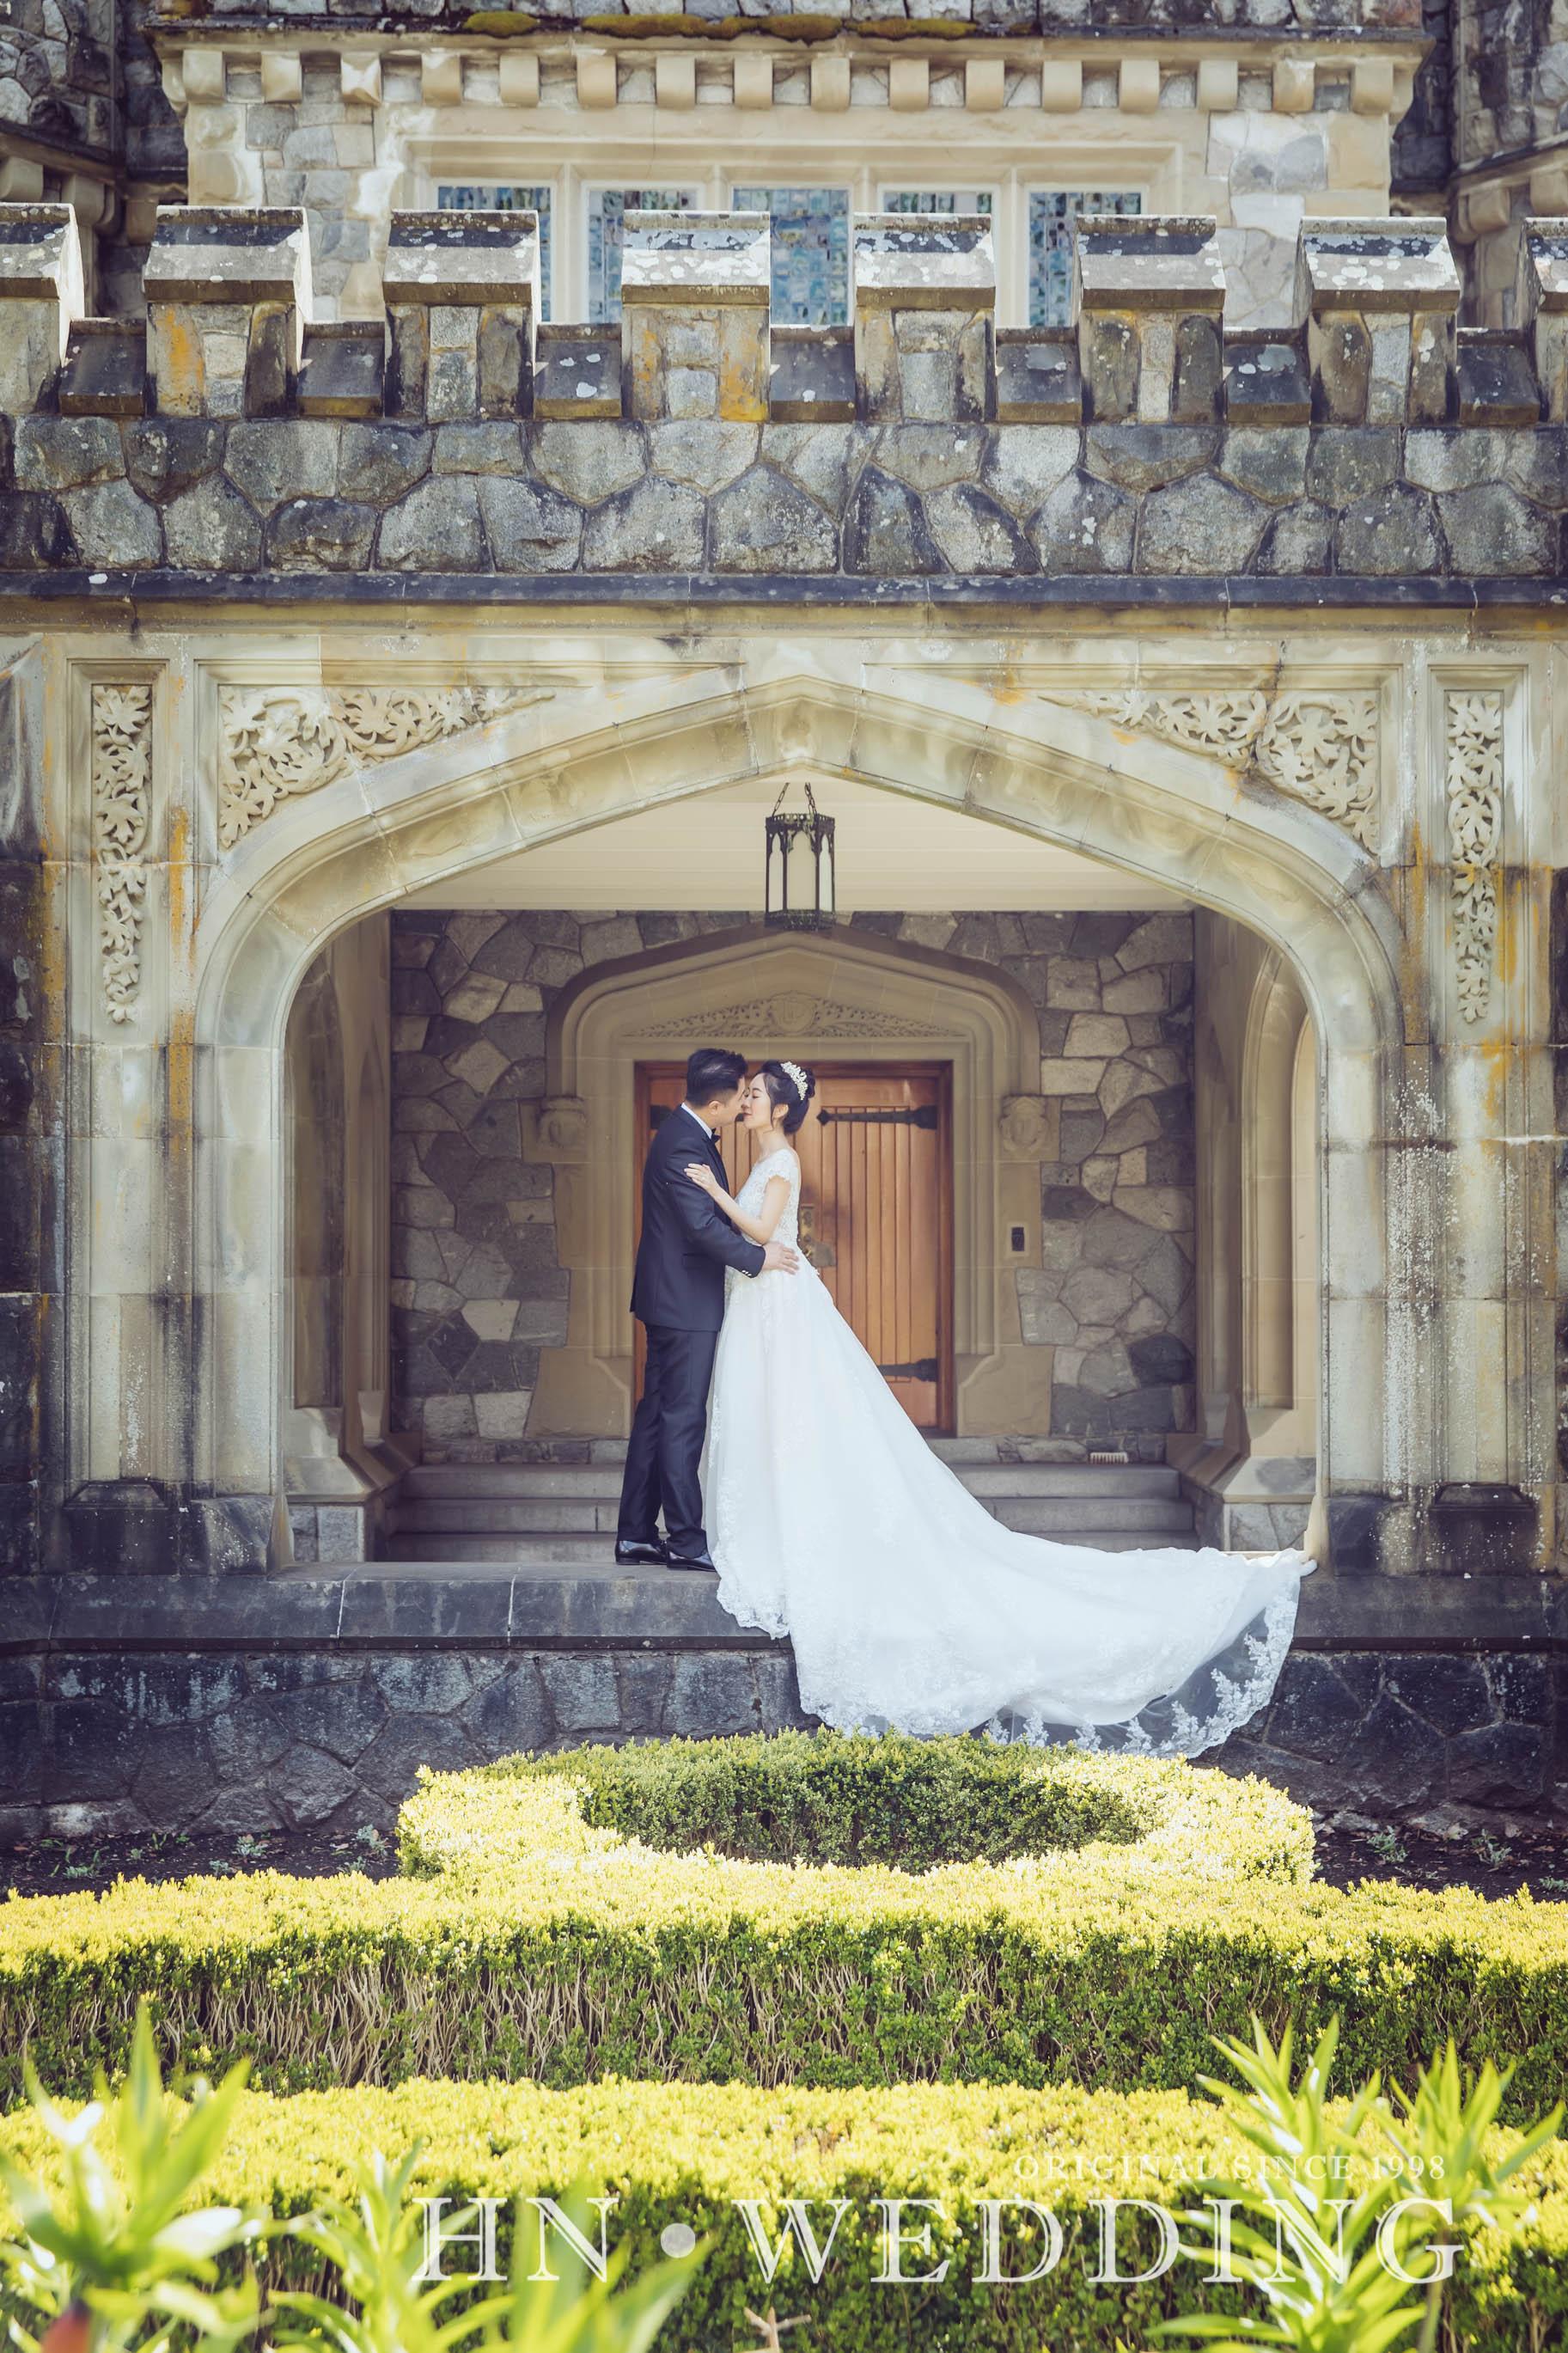 hnweddingprewedding2019victora-5.jpg